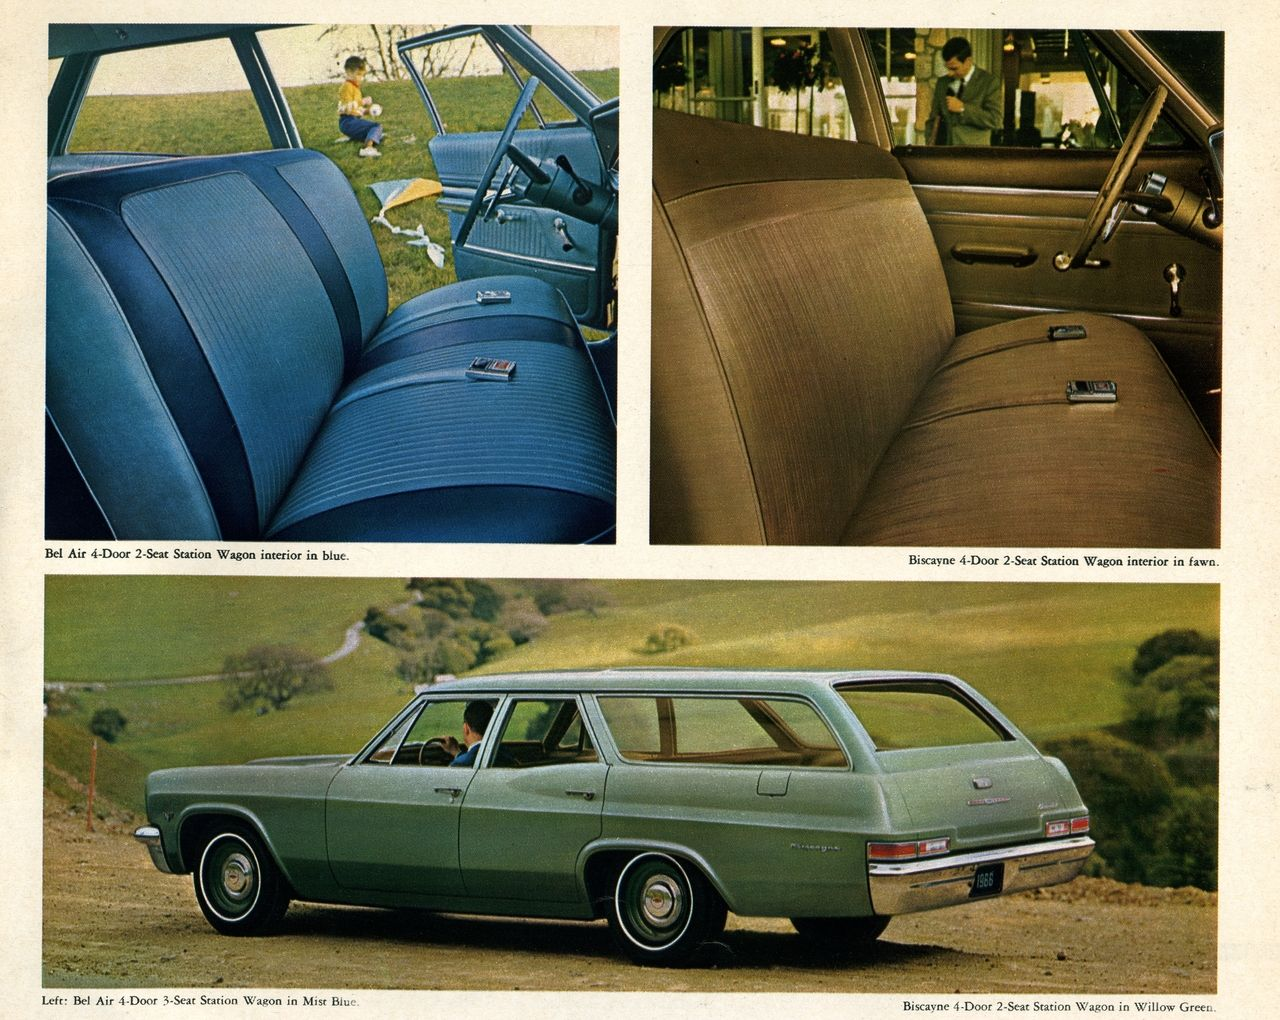 1966 chevrolet impala long roofs chevrolet impala. Black Bedroom Furniture Sets. Home Design Ideas